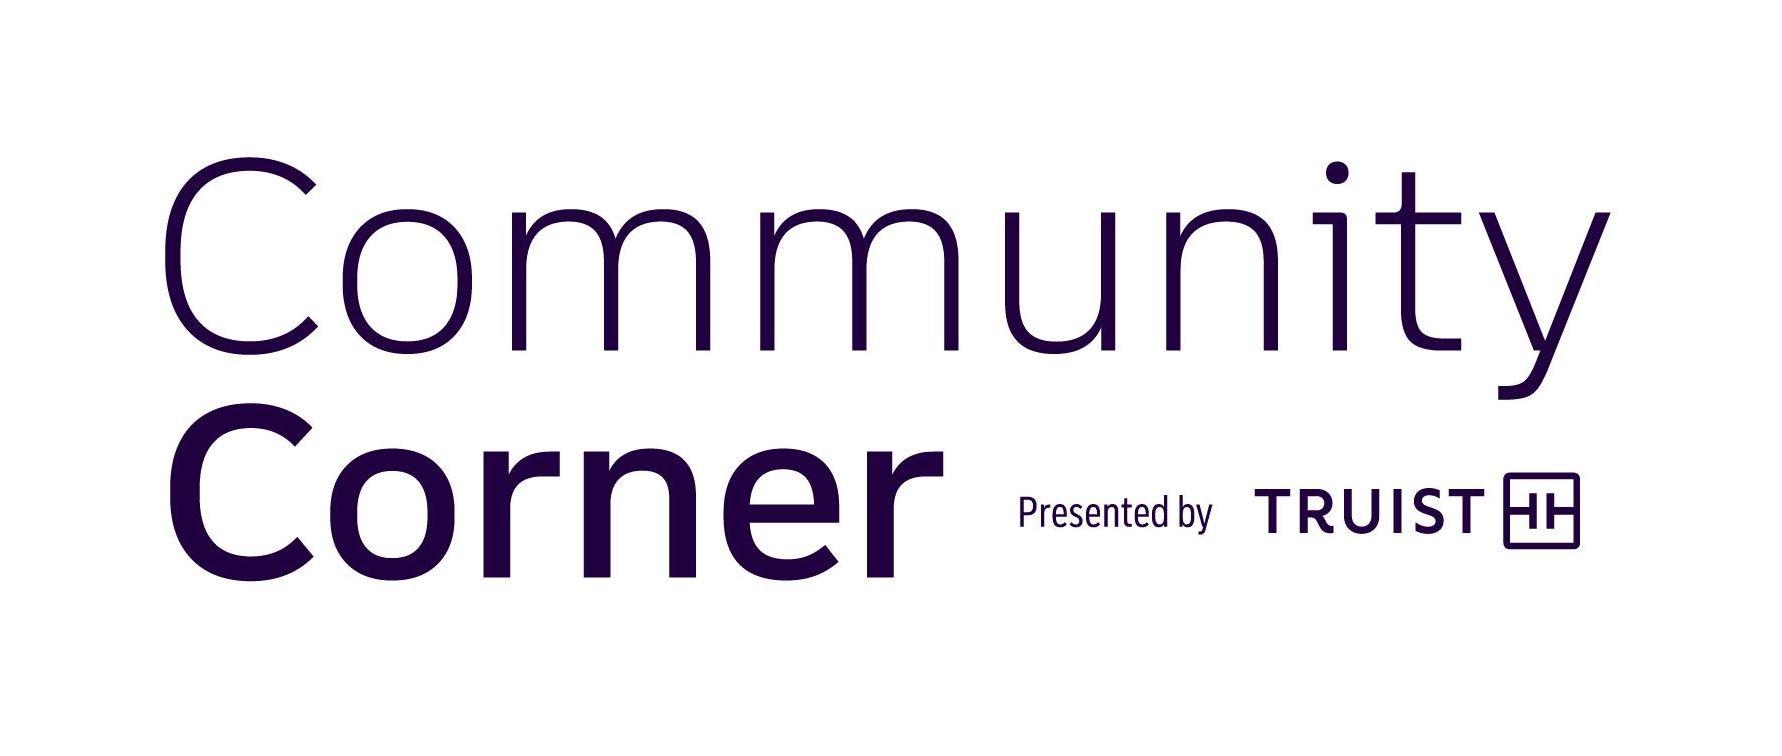 Logo - Community Corner presented by Truist